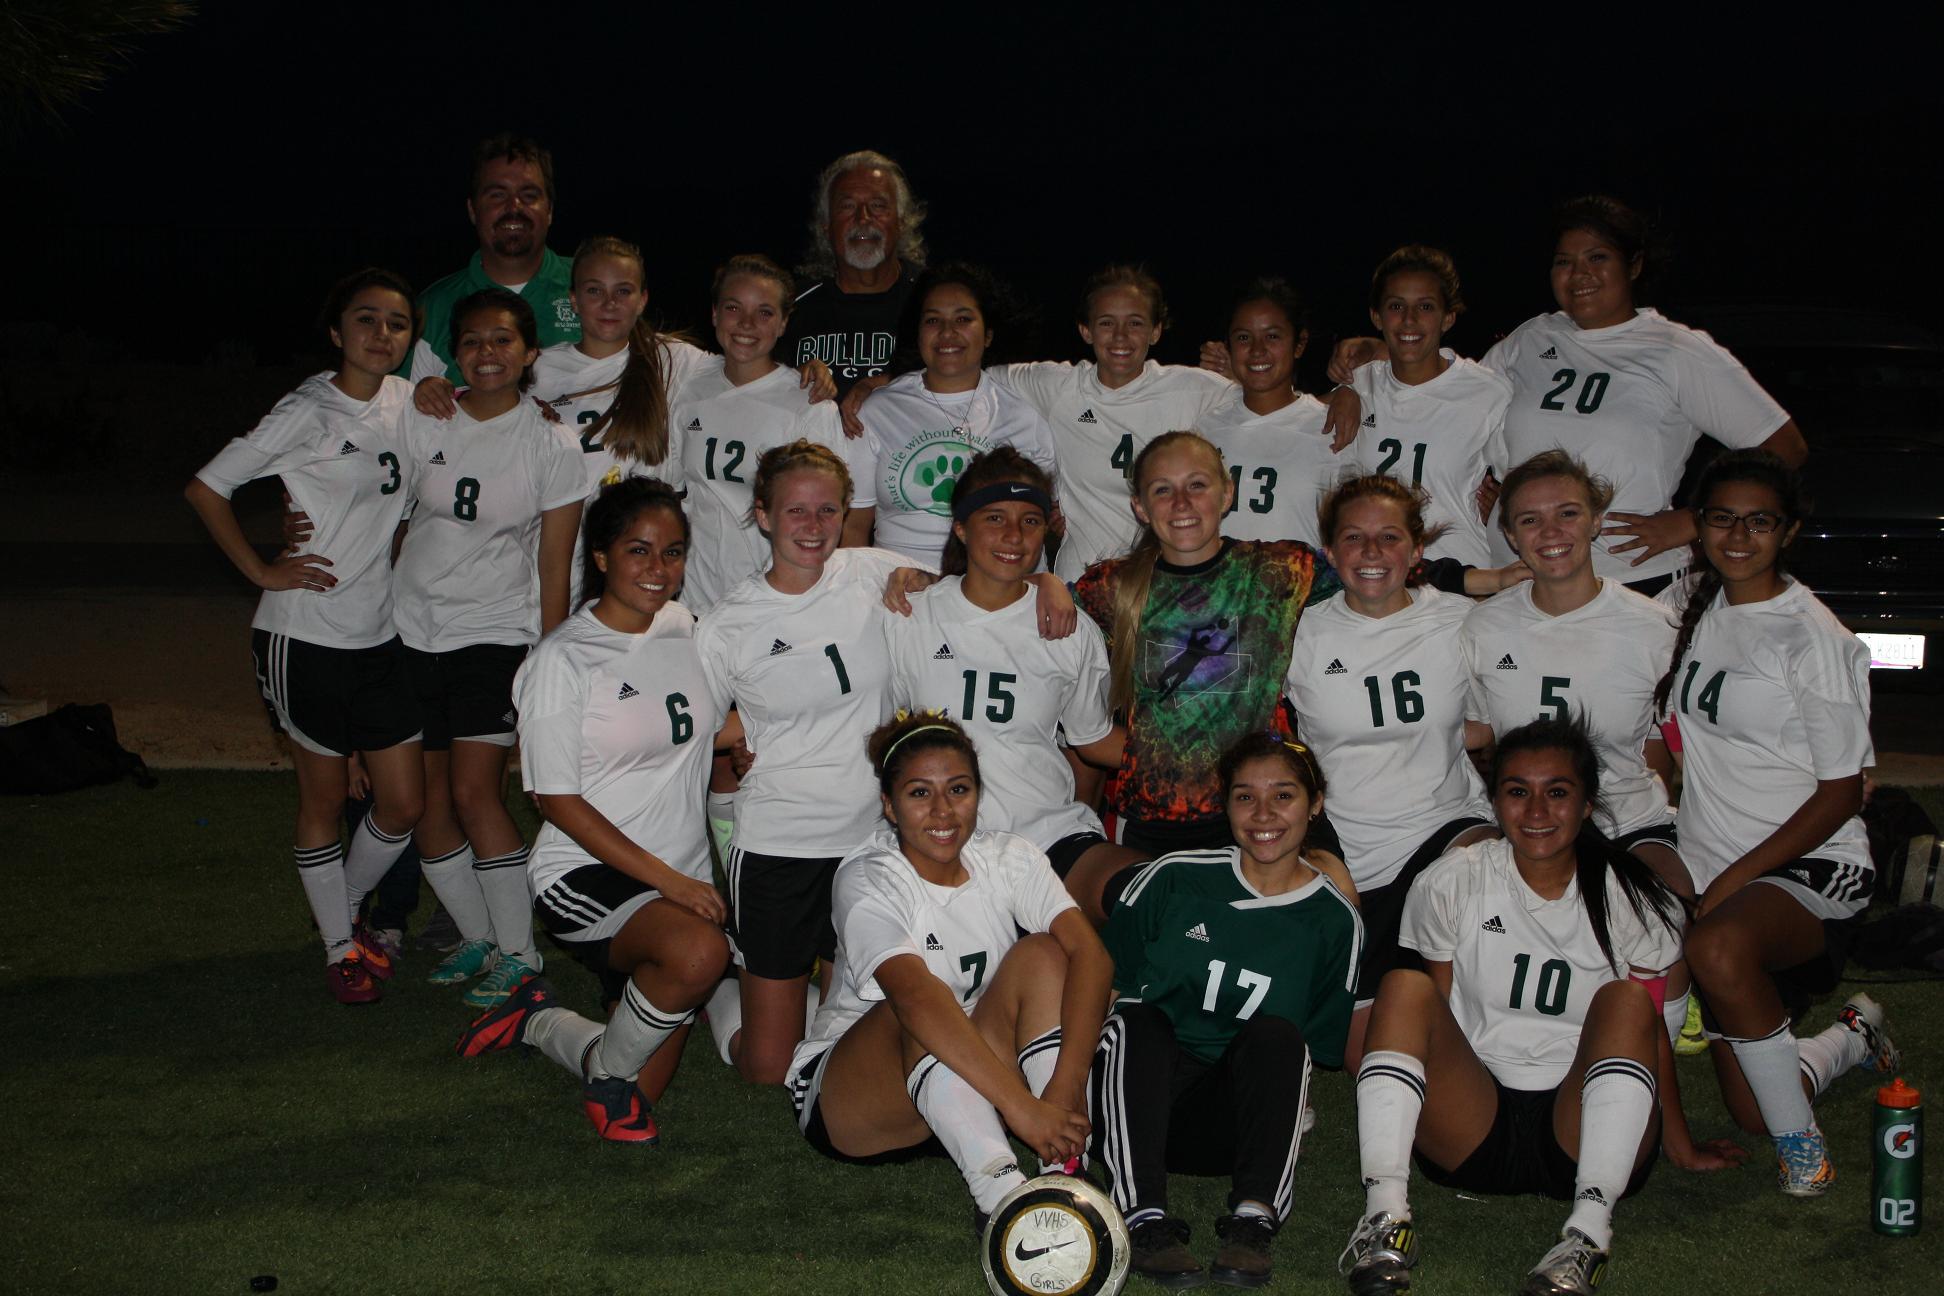 Kokopelli Athlete of the Week: 2014 Girls' Soccer Team